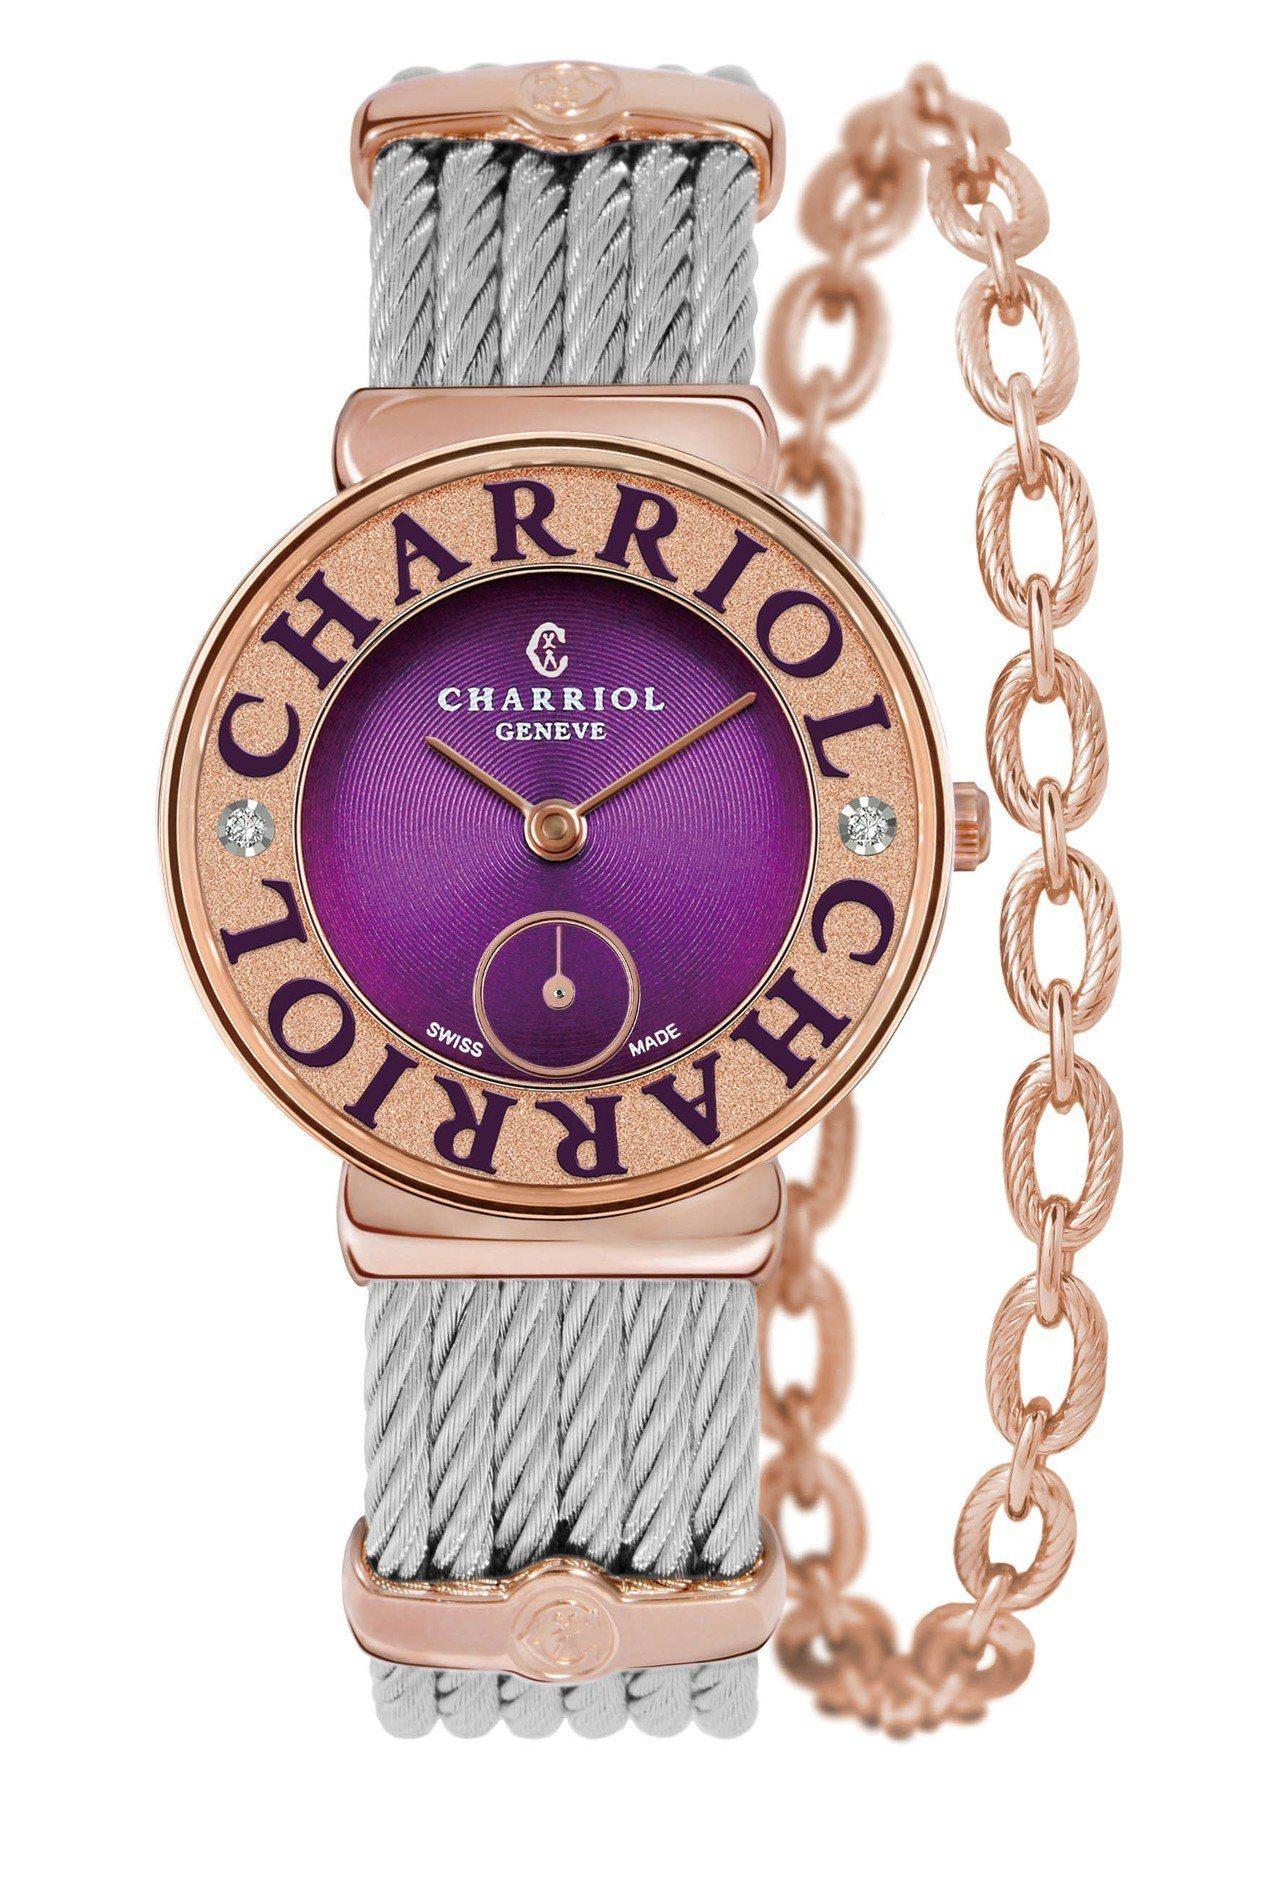 CHARRIOL ST-TROPEZ腕錶售價78400元。 圖/SOGO提供